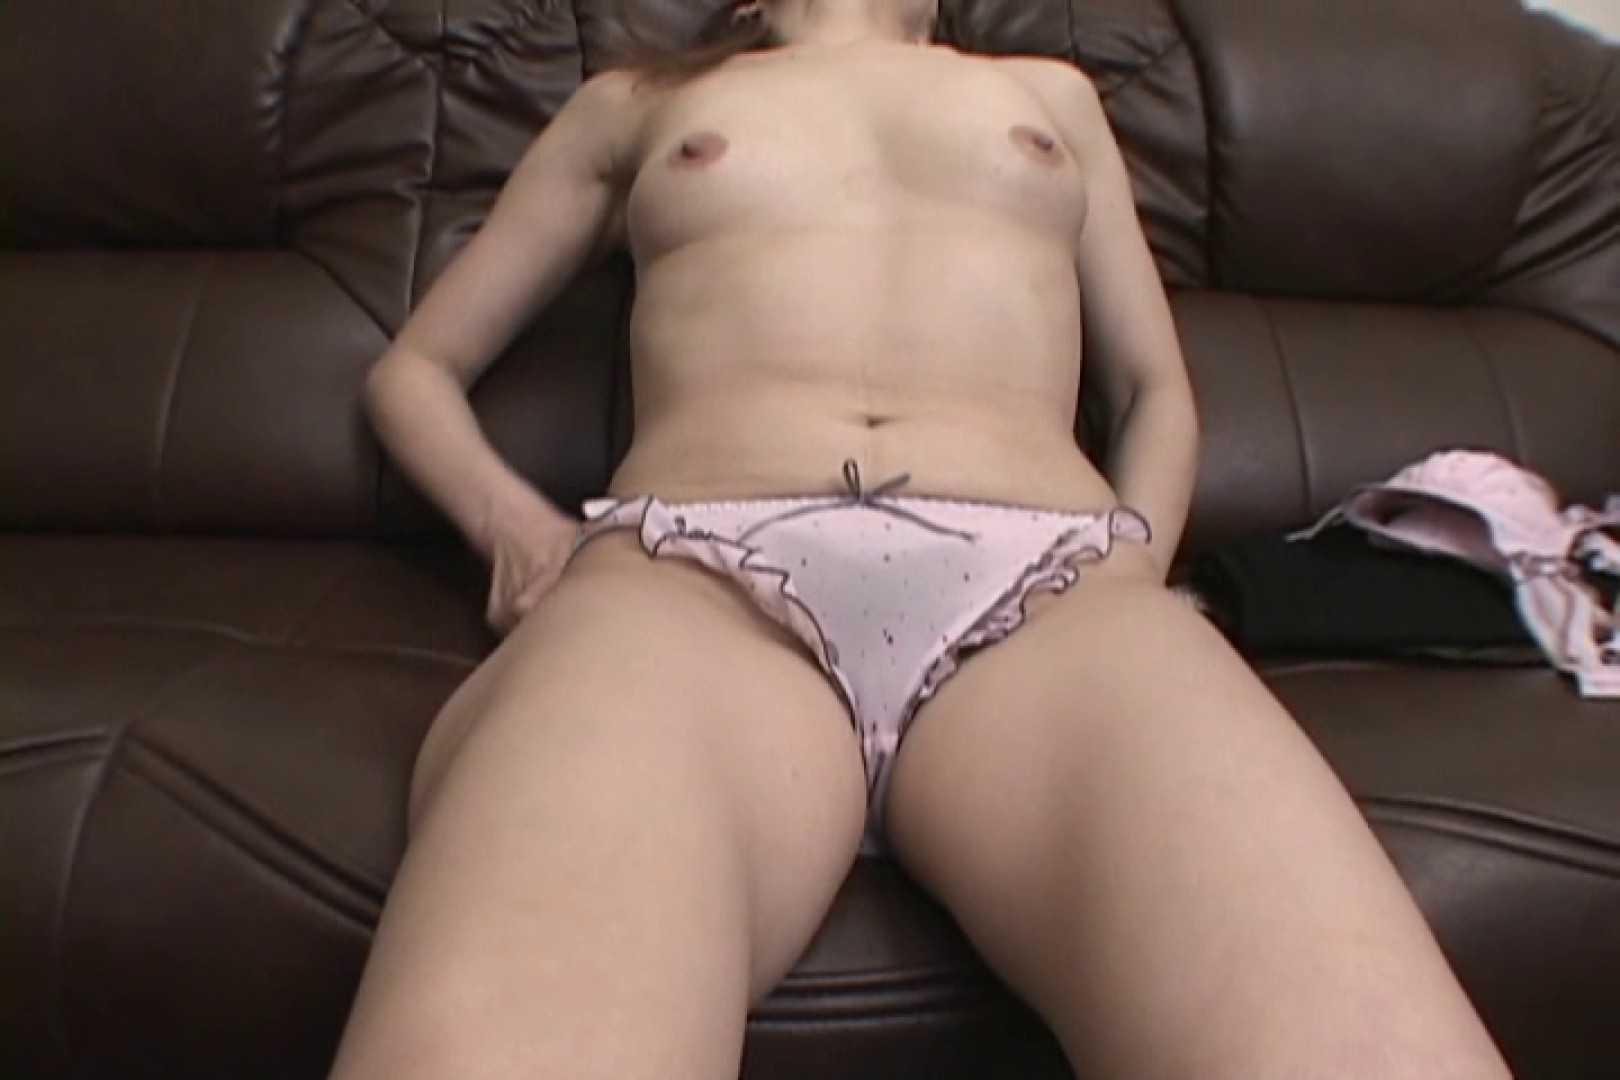 AV面接のはずなのに、こんなことまで・・・。~近藤ますみ~ 車 セックス無修正動画無料 95pic 74